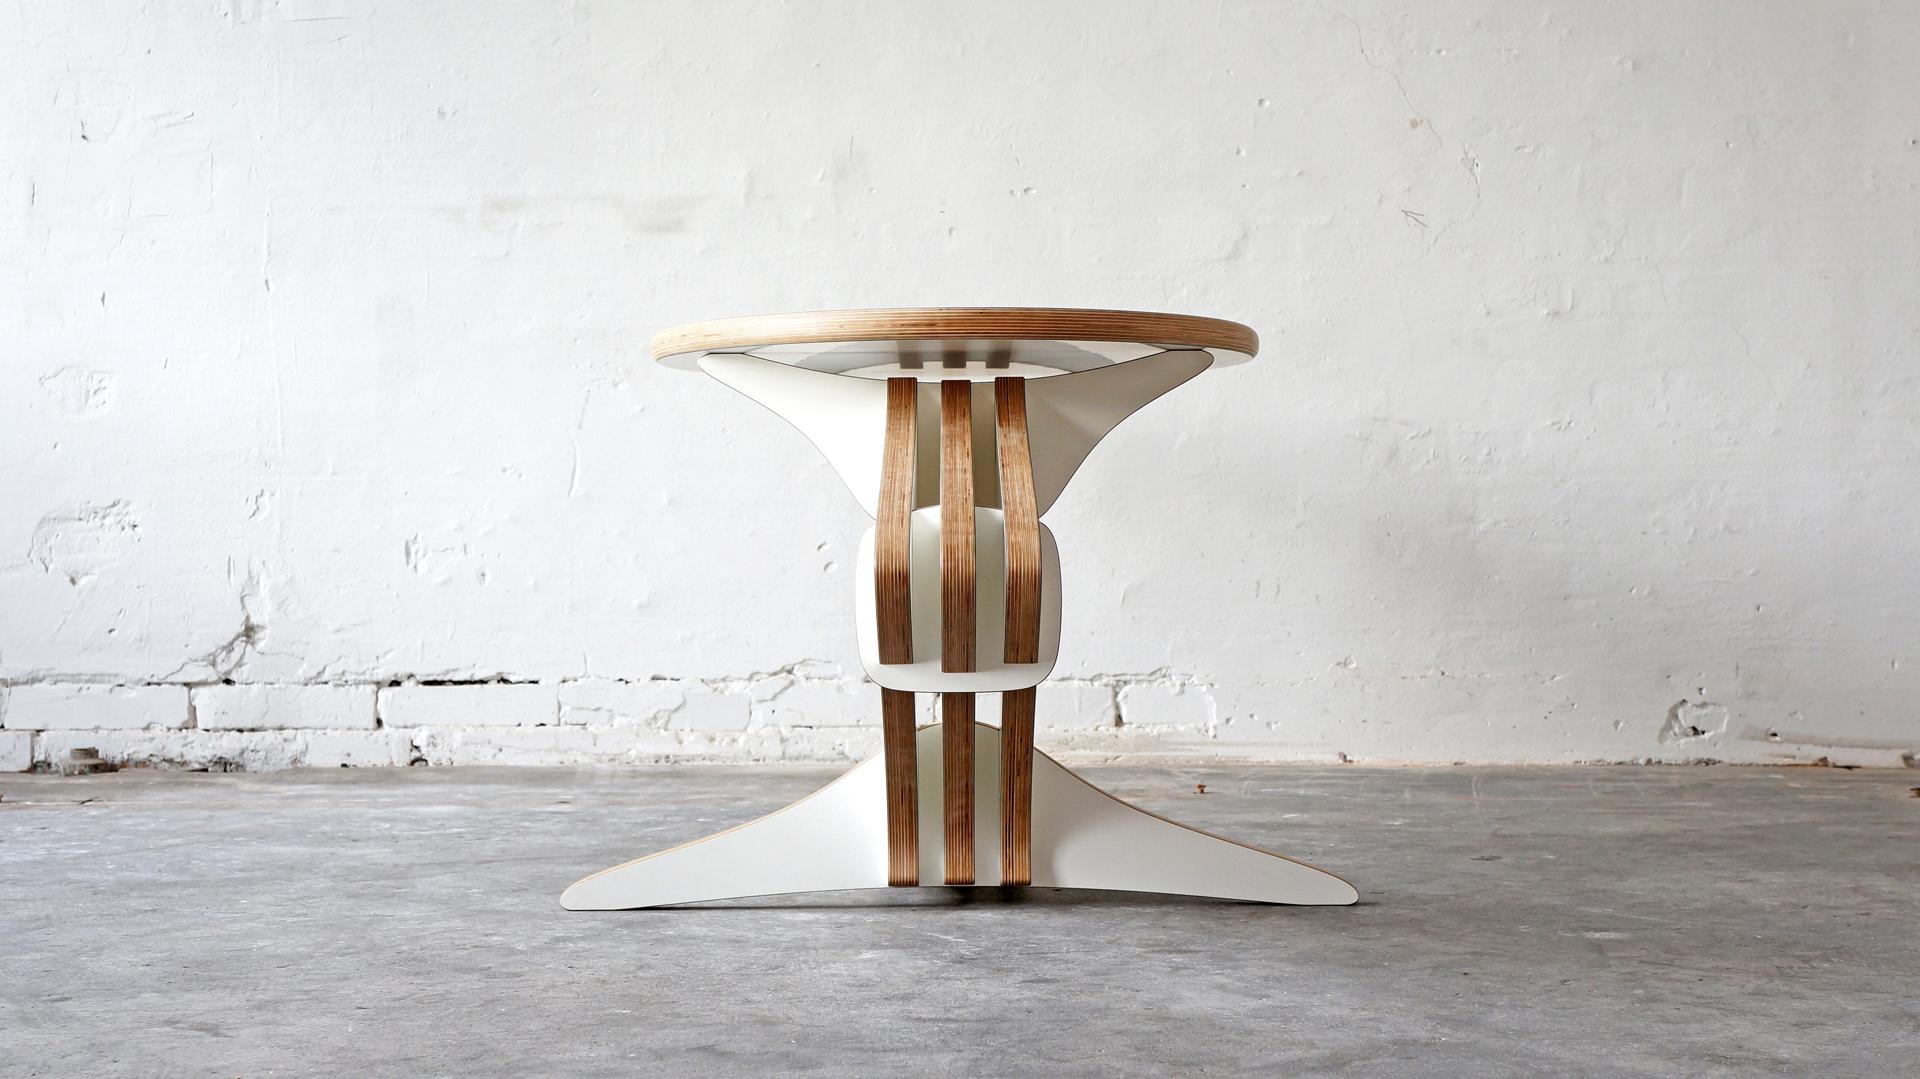 Qvist Coffee Table by Peter Qvist Lorentsen